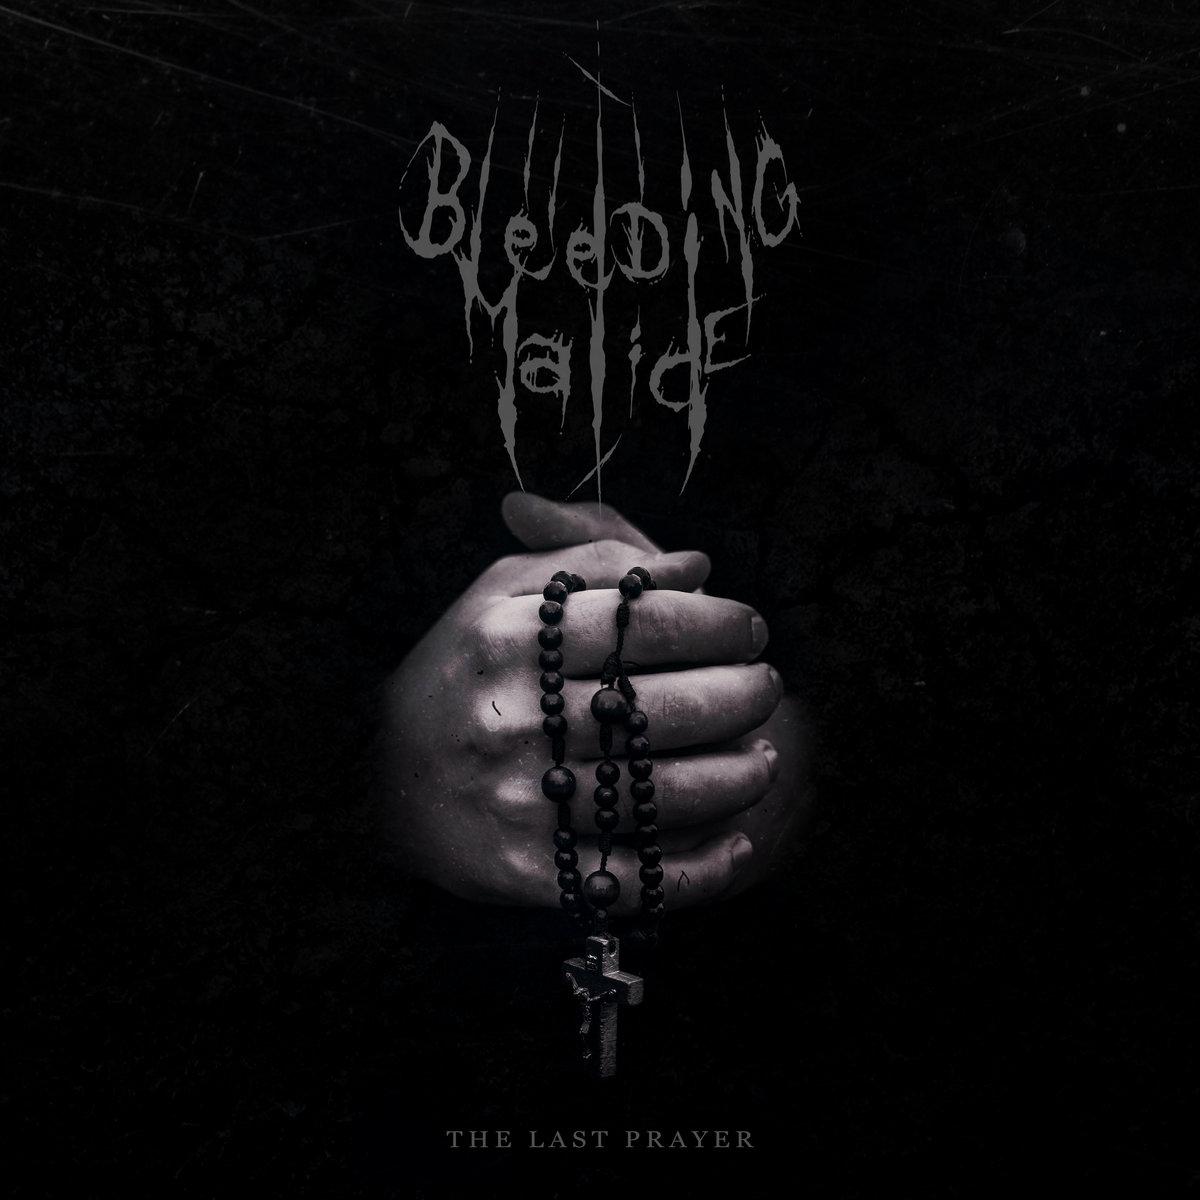 Bleeding Malice - The Last Prayer [single] (2020)